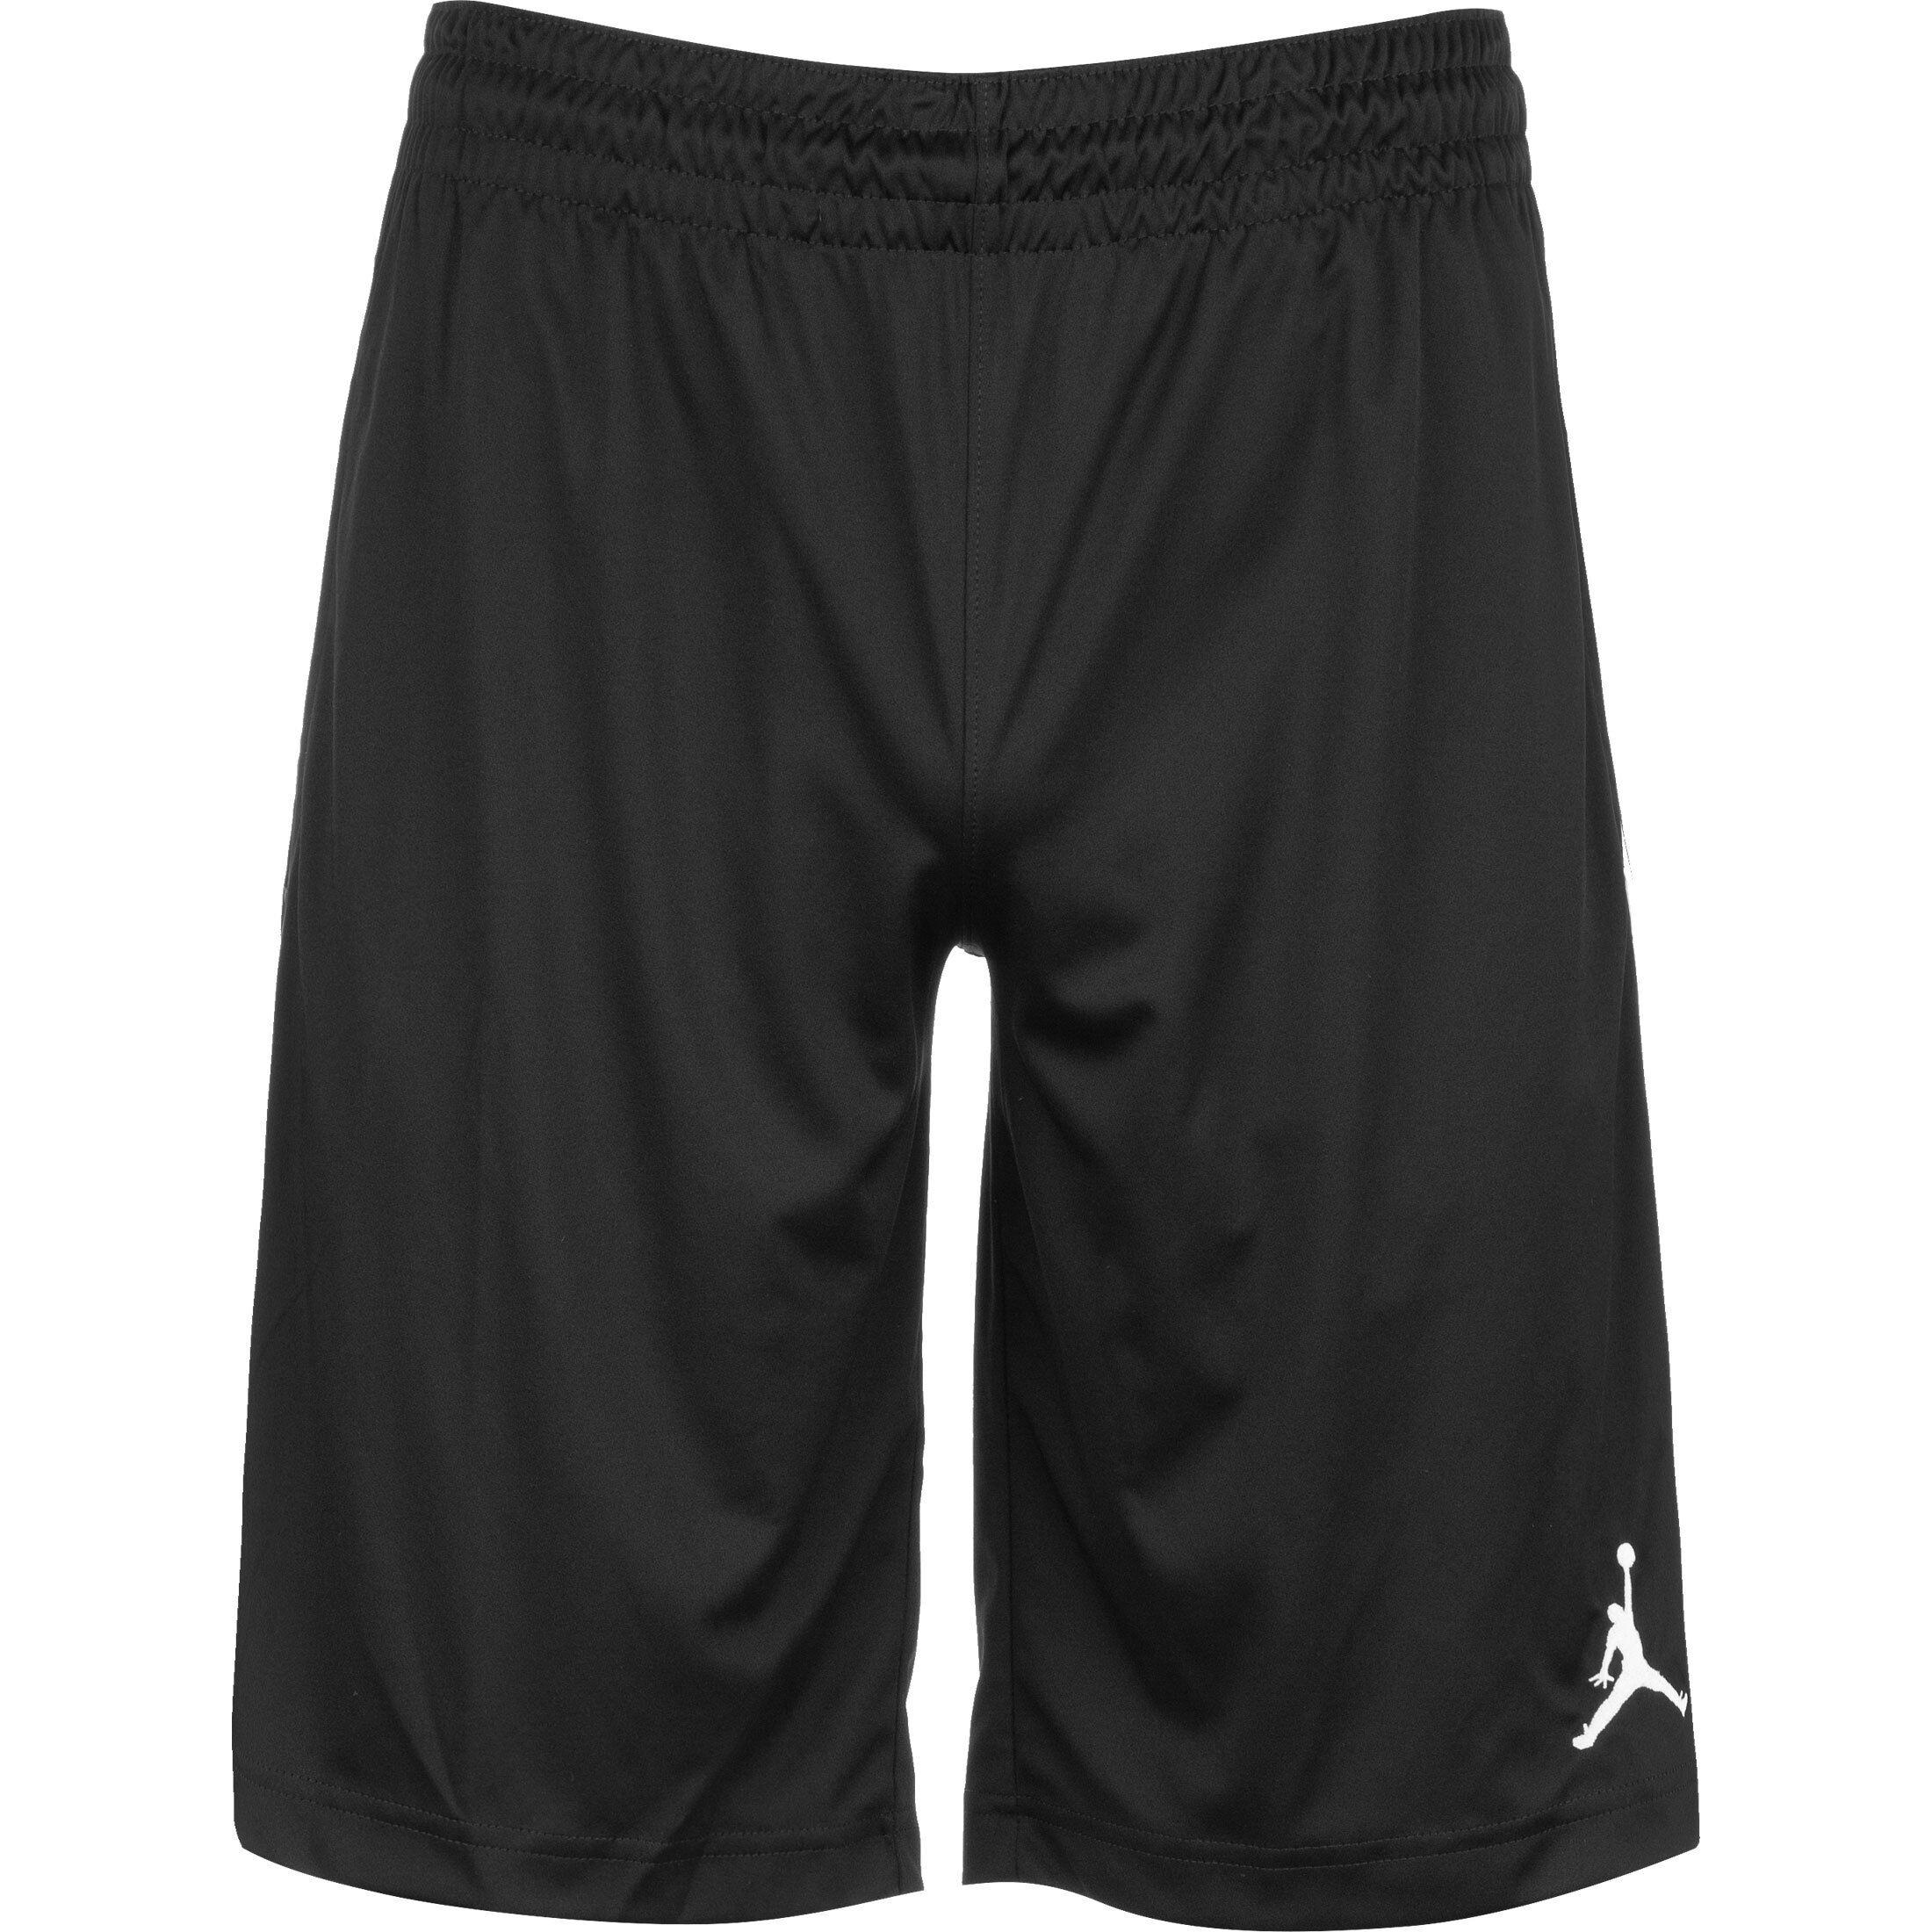 Nike Performance Jordan 23 Alpha Dry Knit Trainingsshort